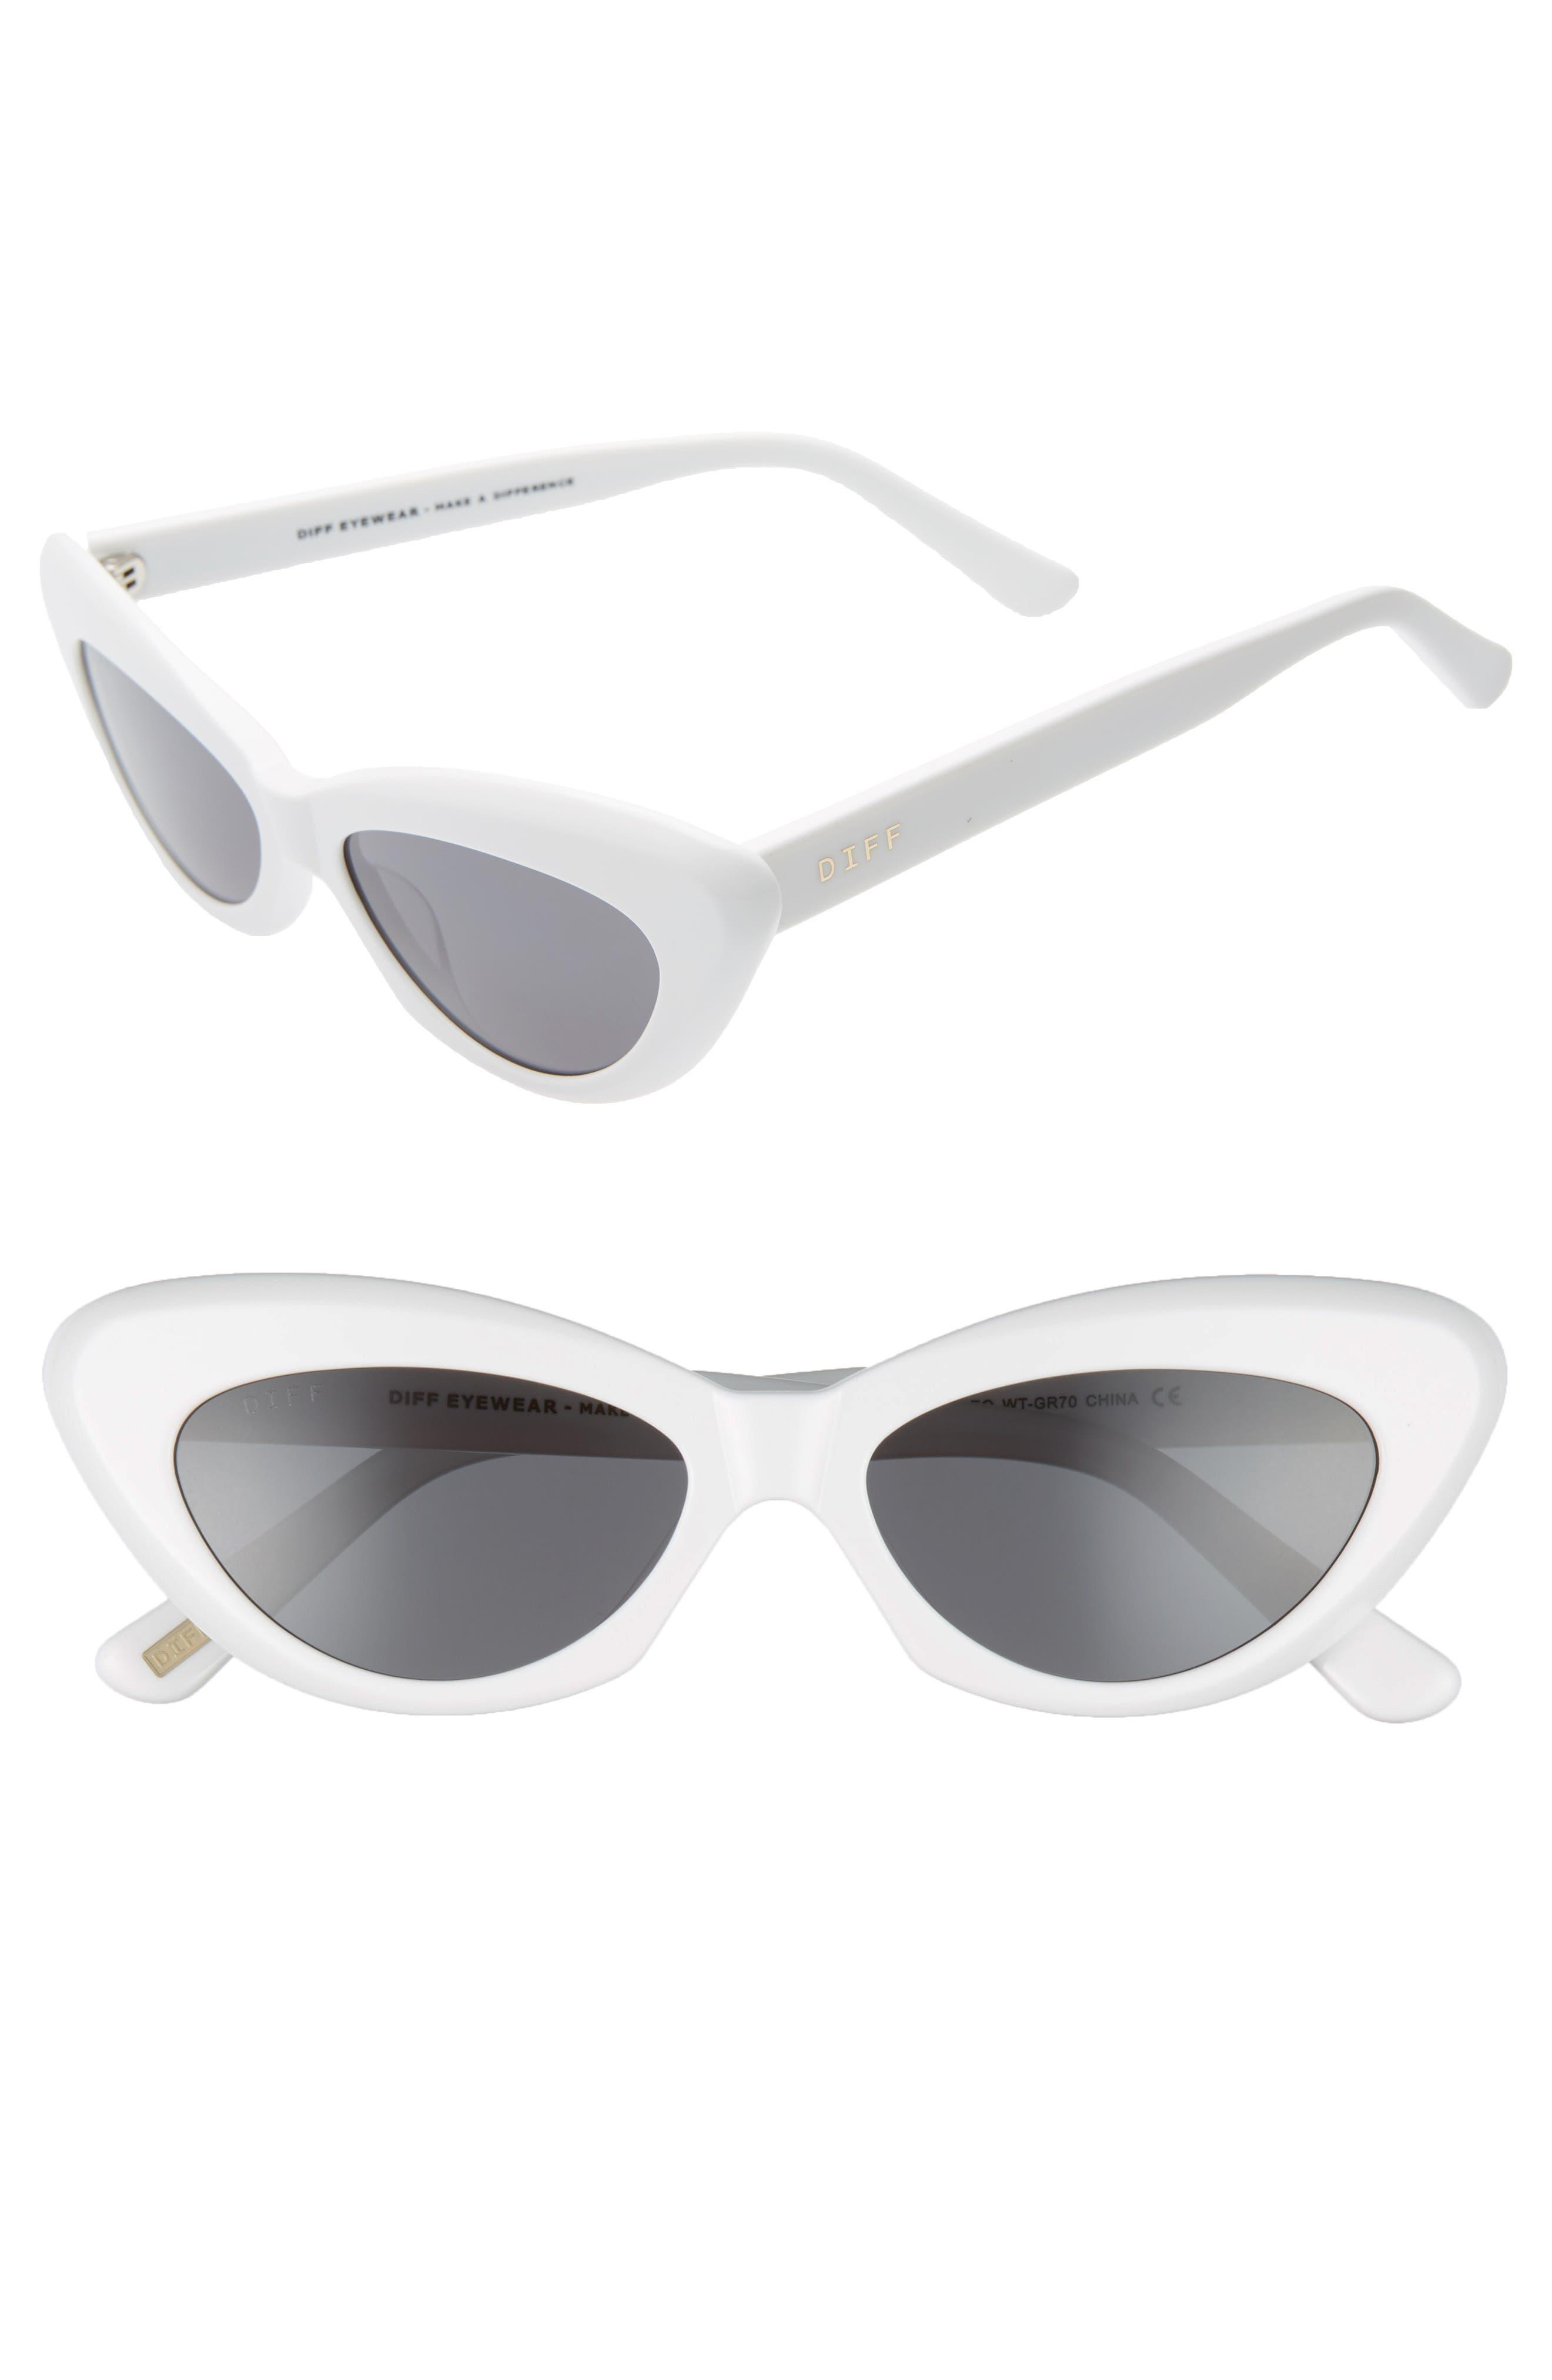 5d615d56f0c0 DIFF Sunglasses for Women | Nordstrom